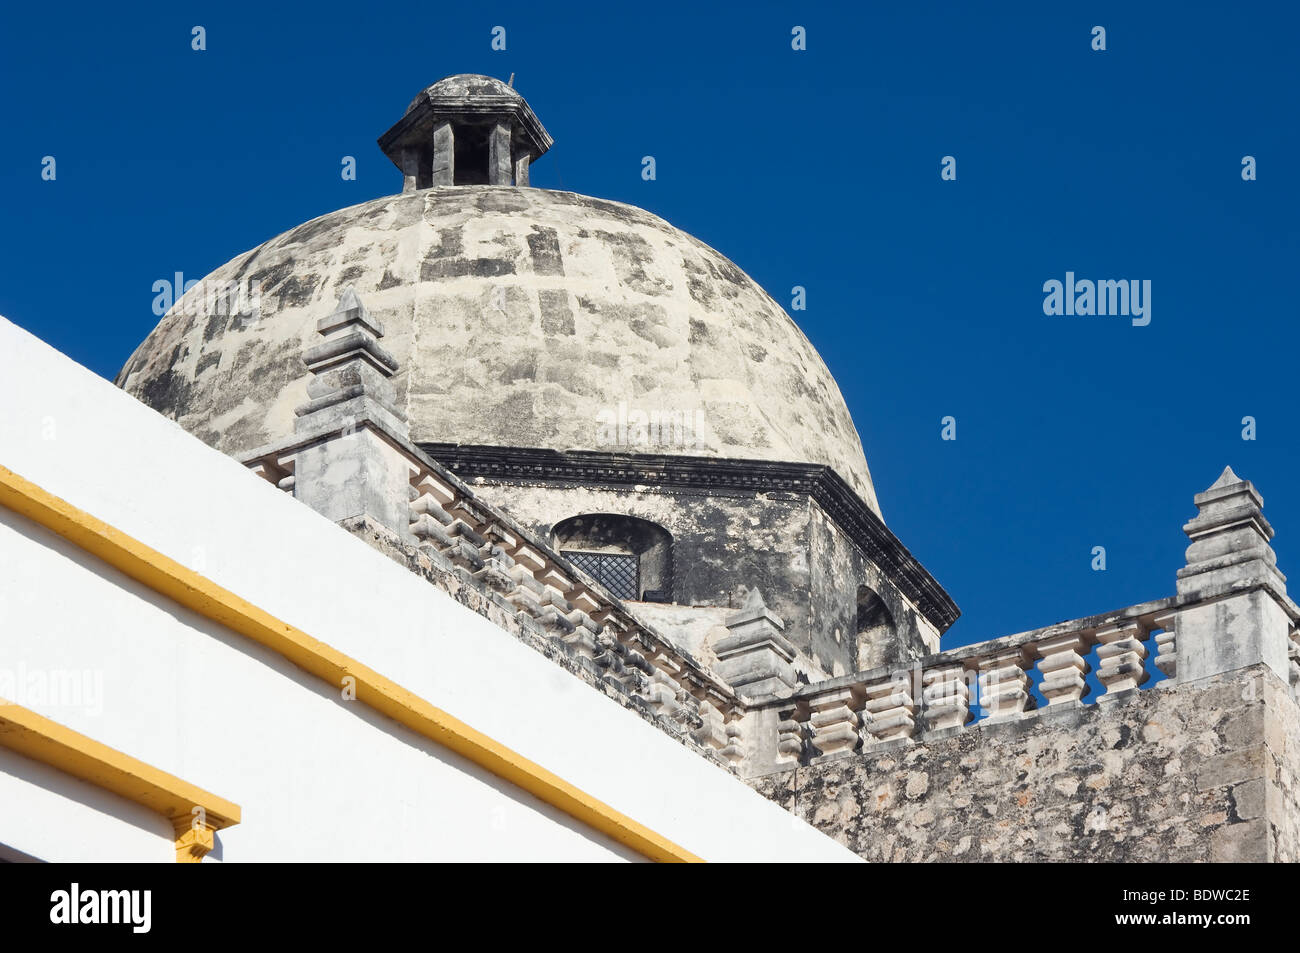 Campeche, San Jose church, Dome, Province of Campeche, Yucatan peninsula, Mexico Stock Photo